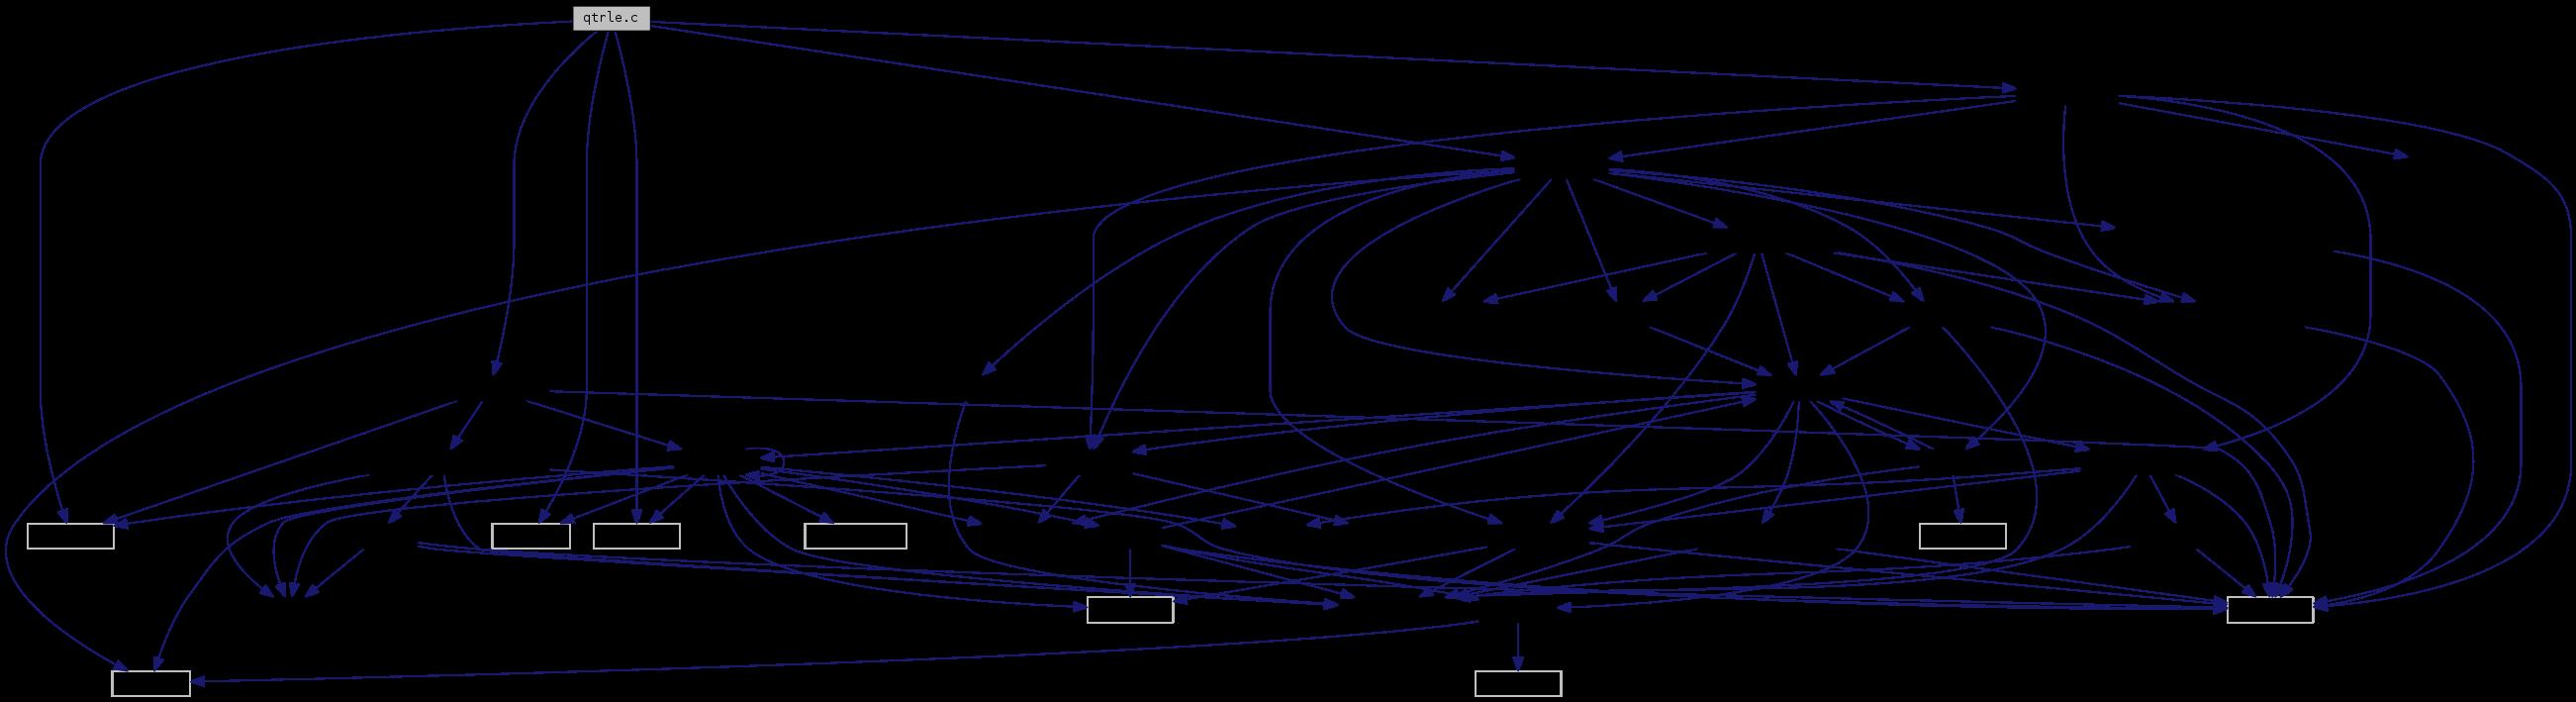 FFmpeg: qtrle c File Reference - Paris Hackday Code - Sound